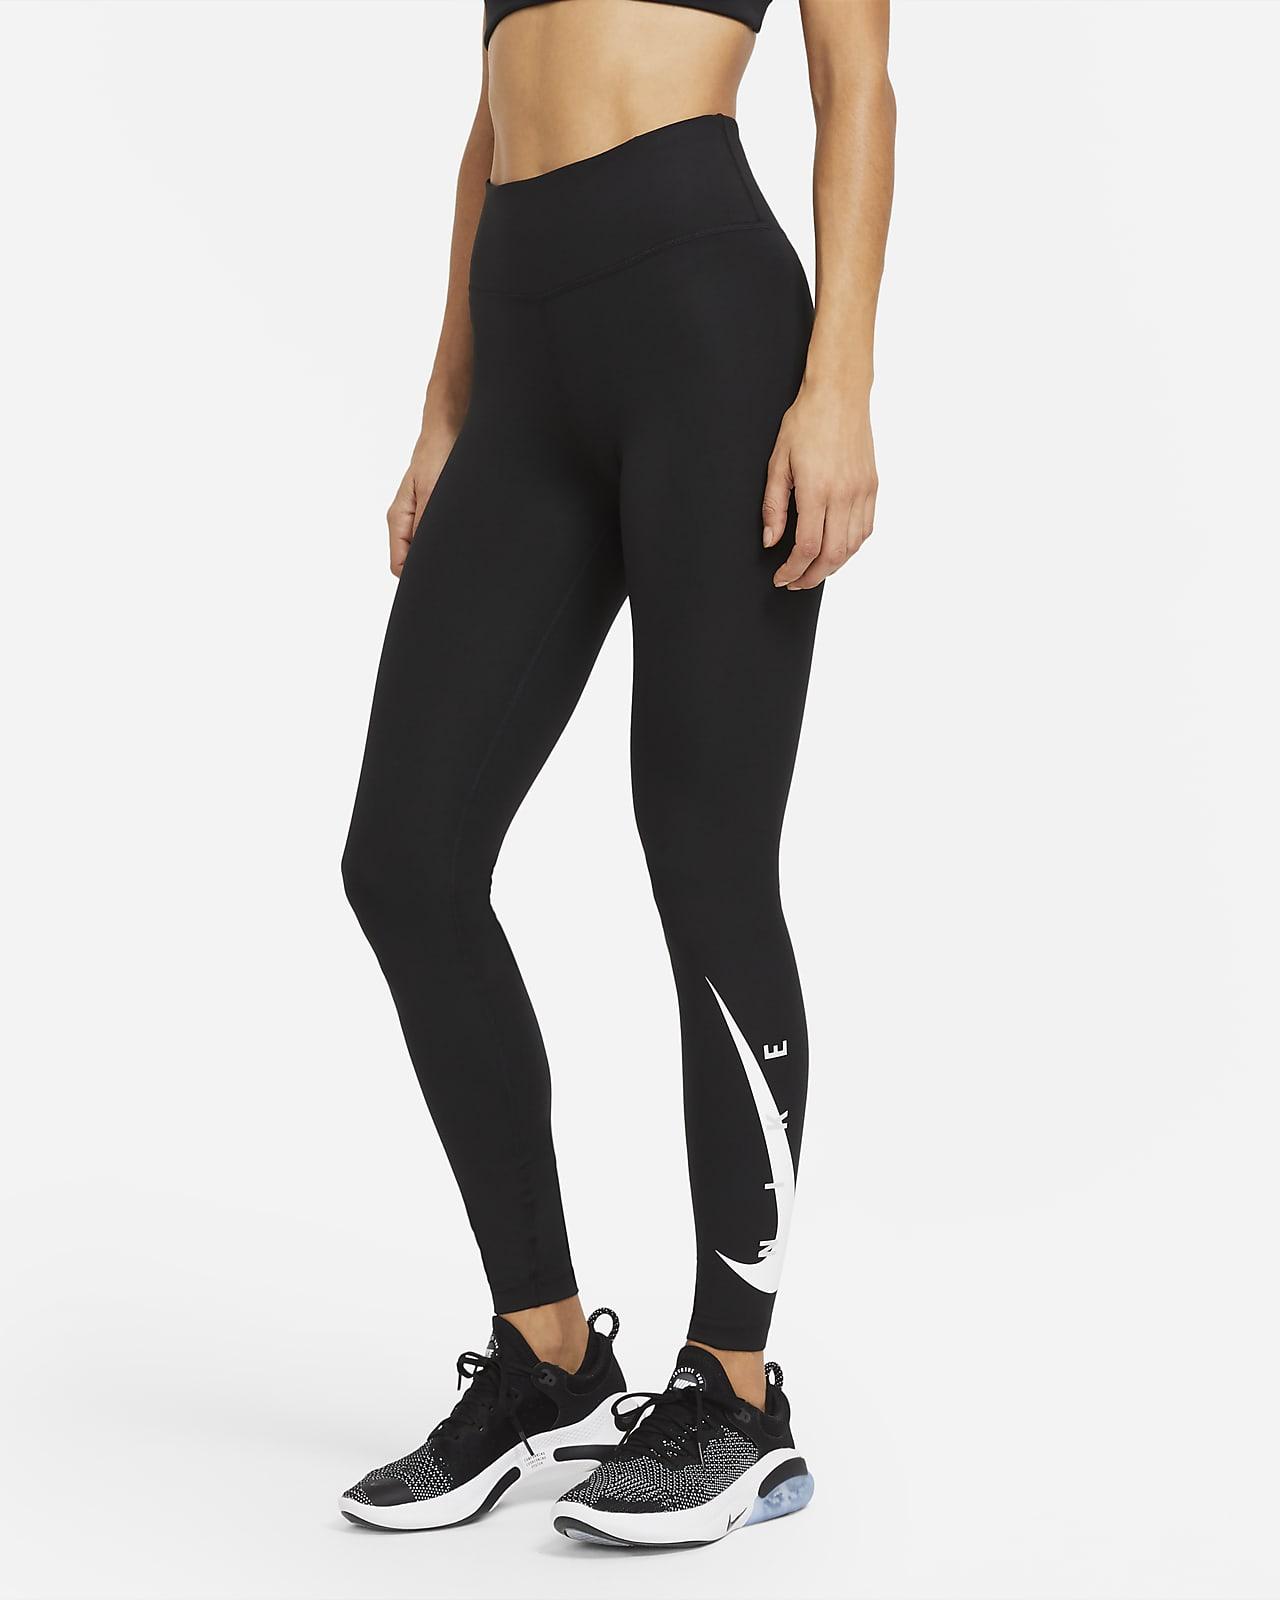 Leggings de running de 7/8 de tiro medio para mujer Nike Swoosh Run